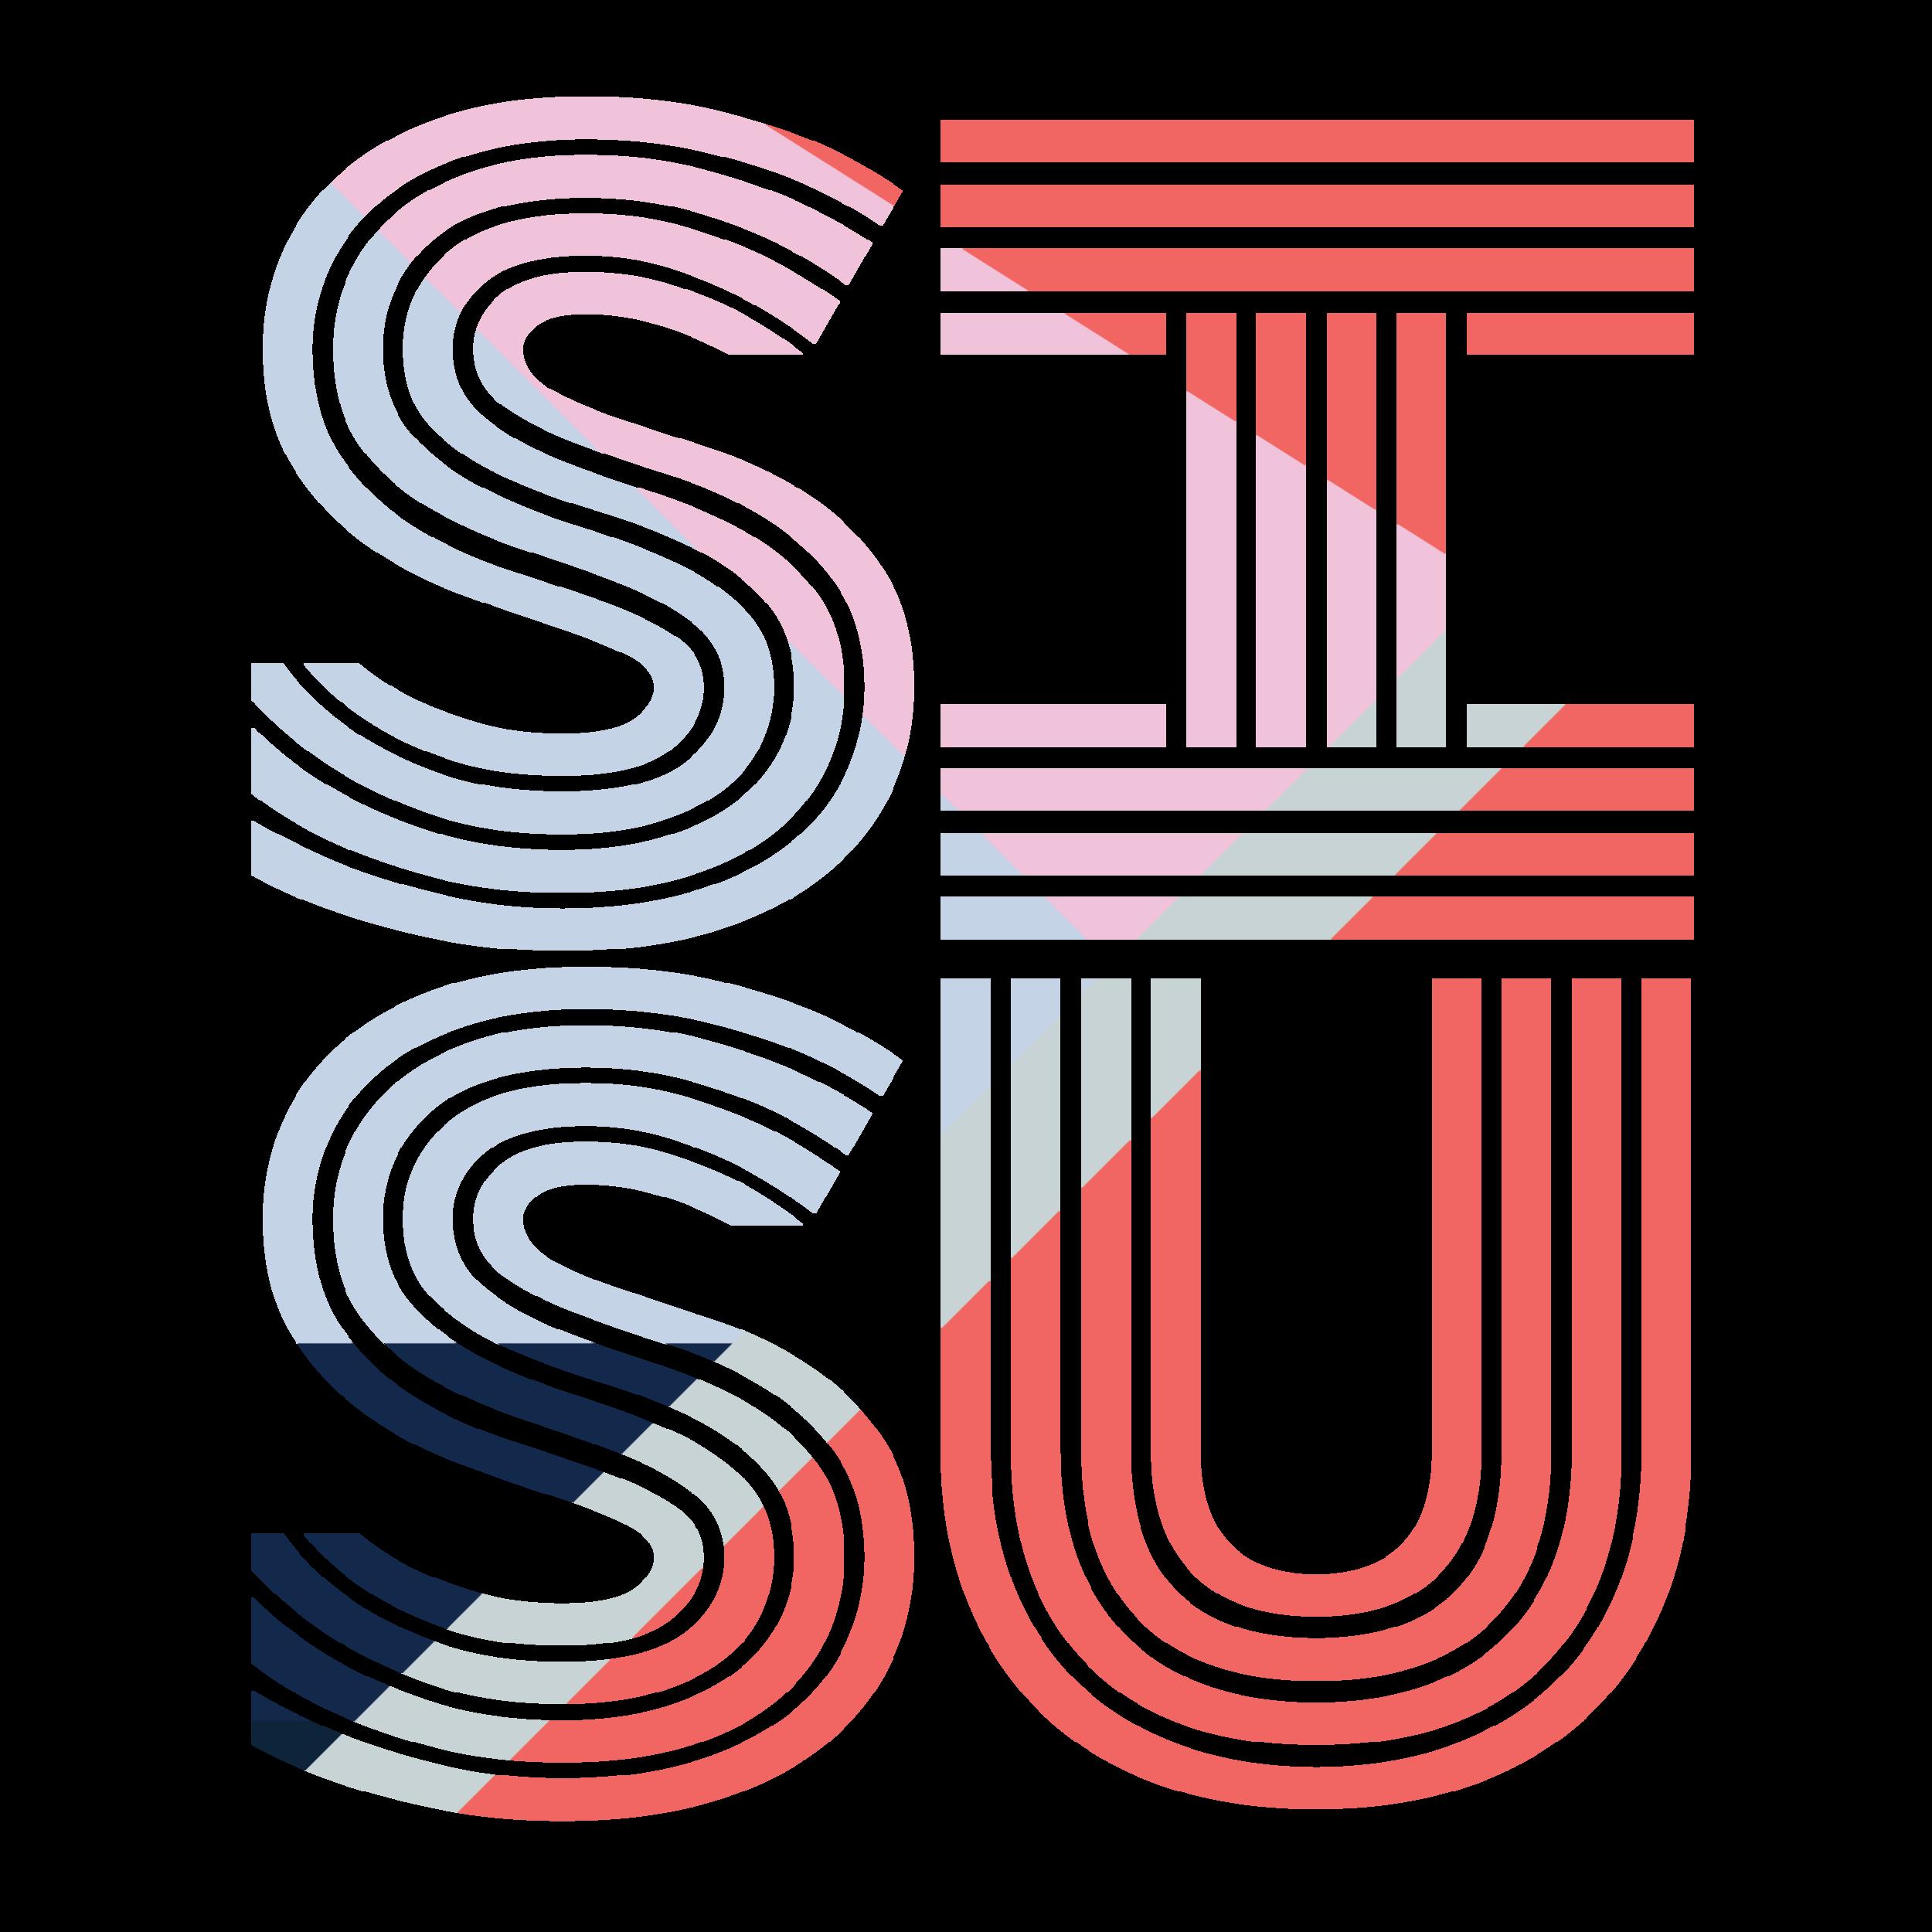 Patterns_v3_SISU.png